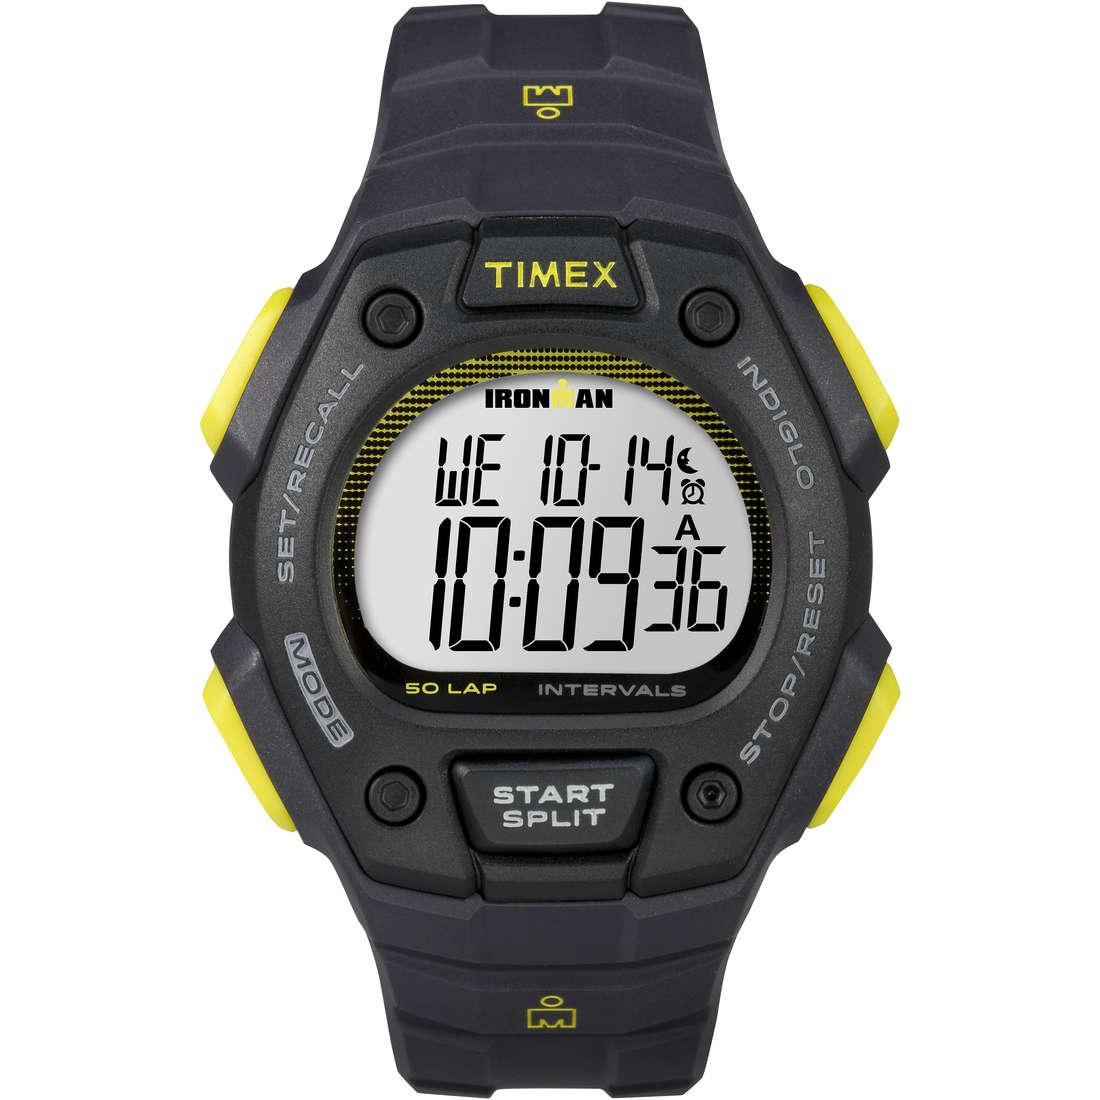 watch chronograph unisex Timex Irm 50 Lap TW5K86100